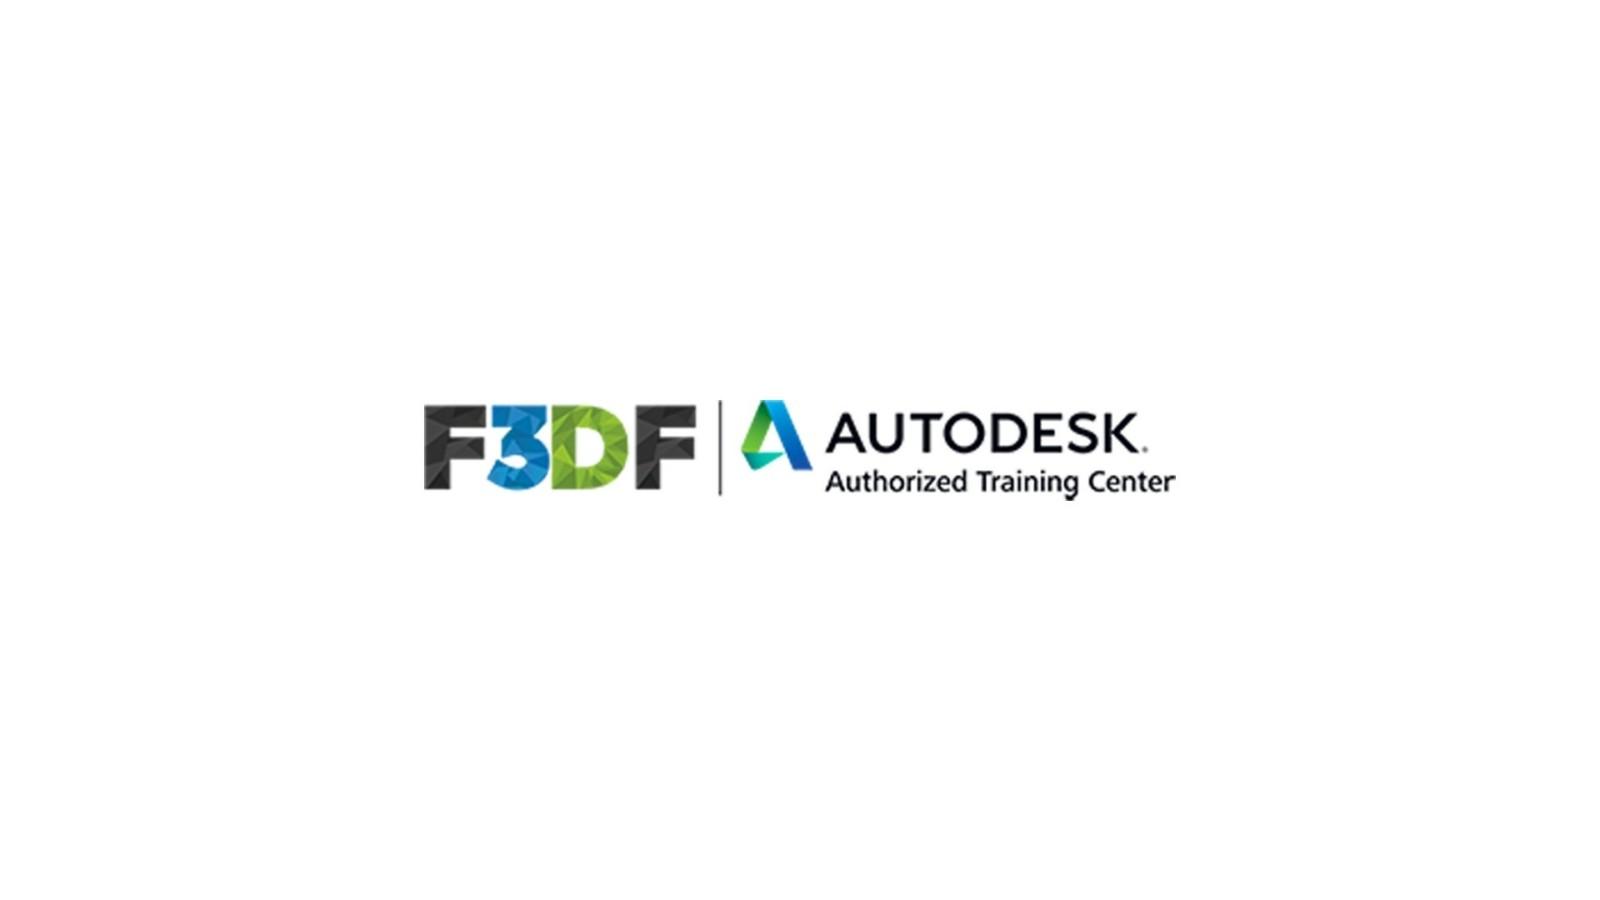 FD3F Autodesk logo